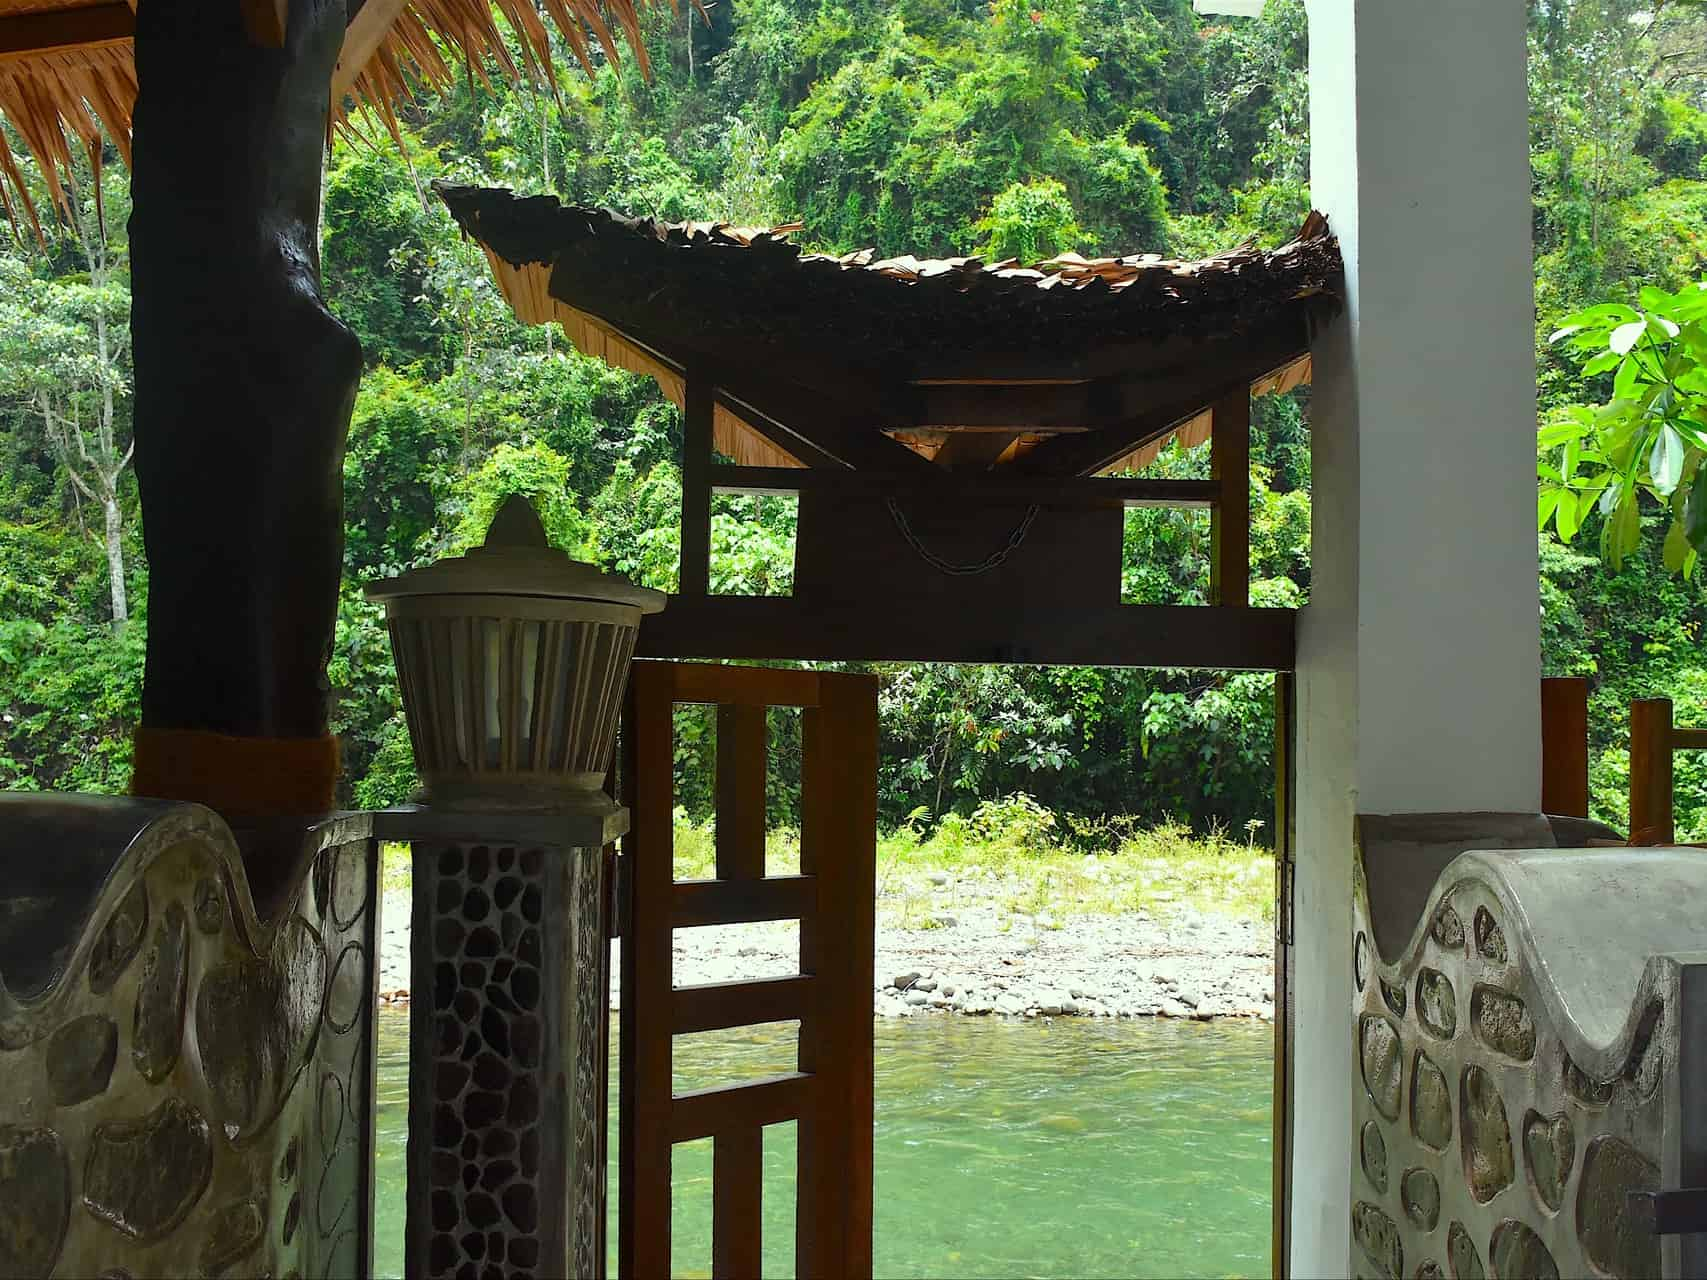 Gate door to the Bohorok River - Hangout@EcoTravel Bukit Lawang